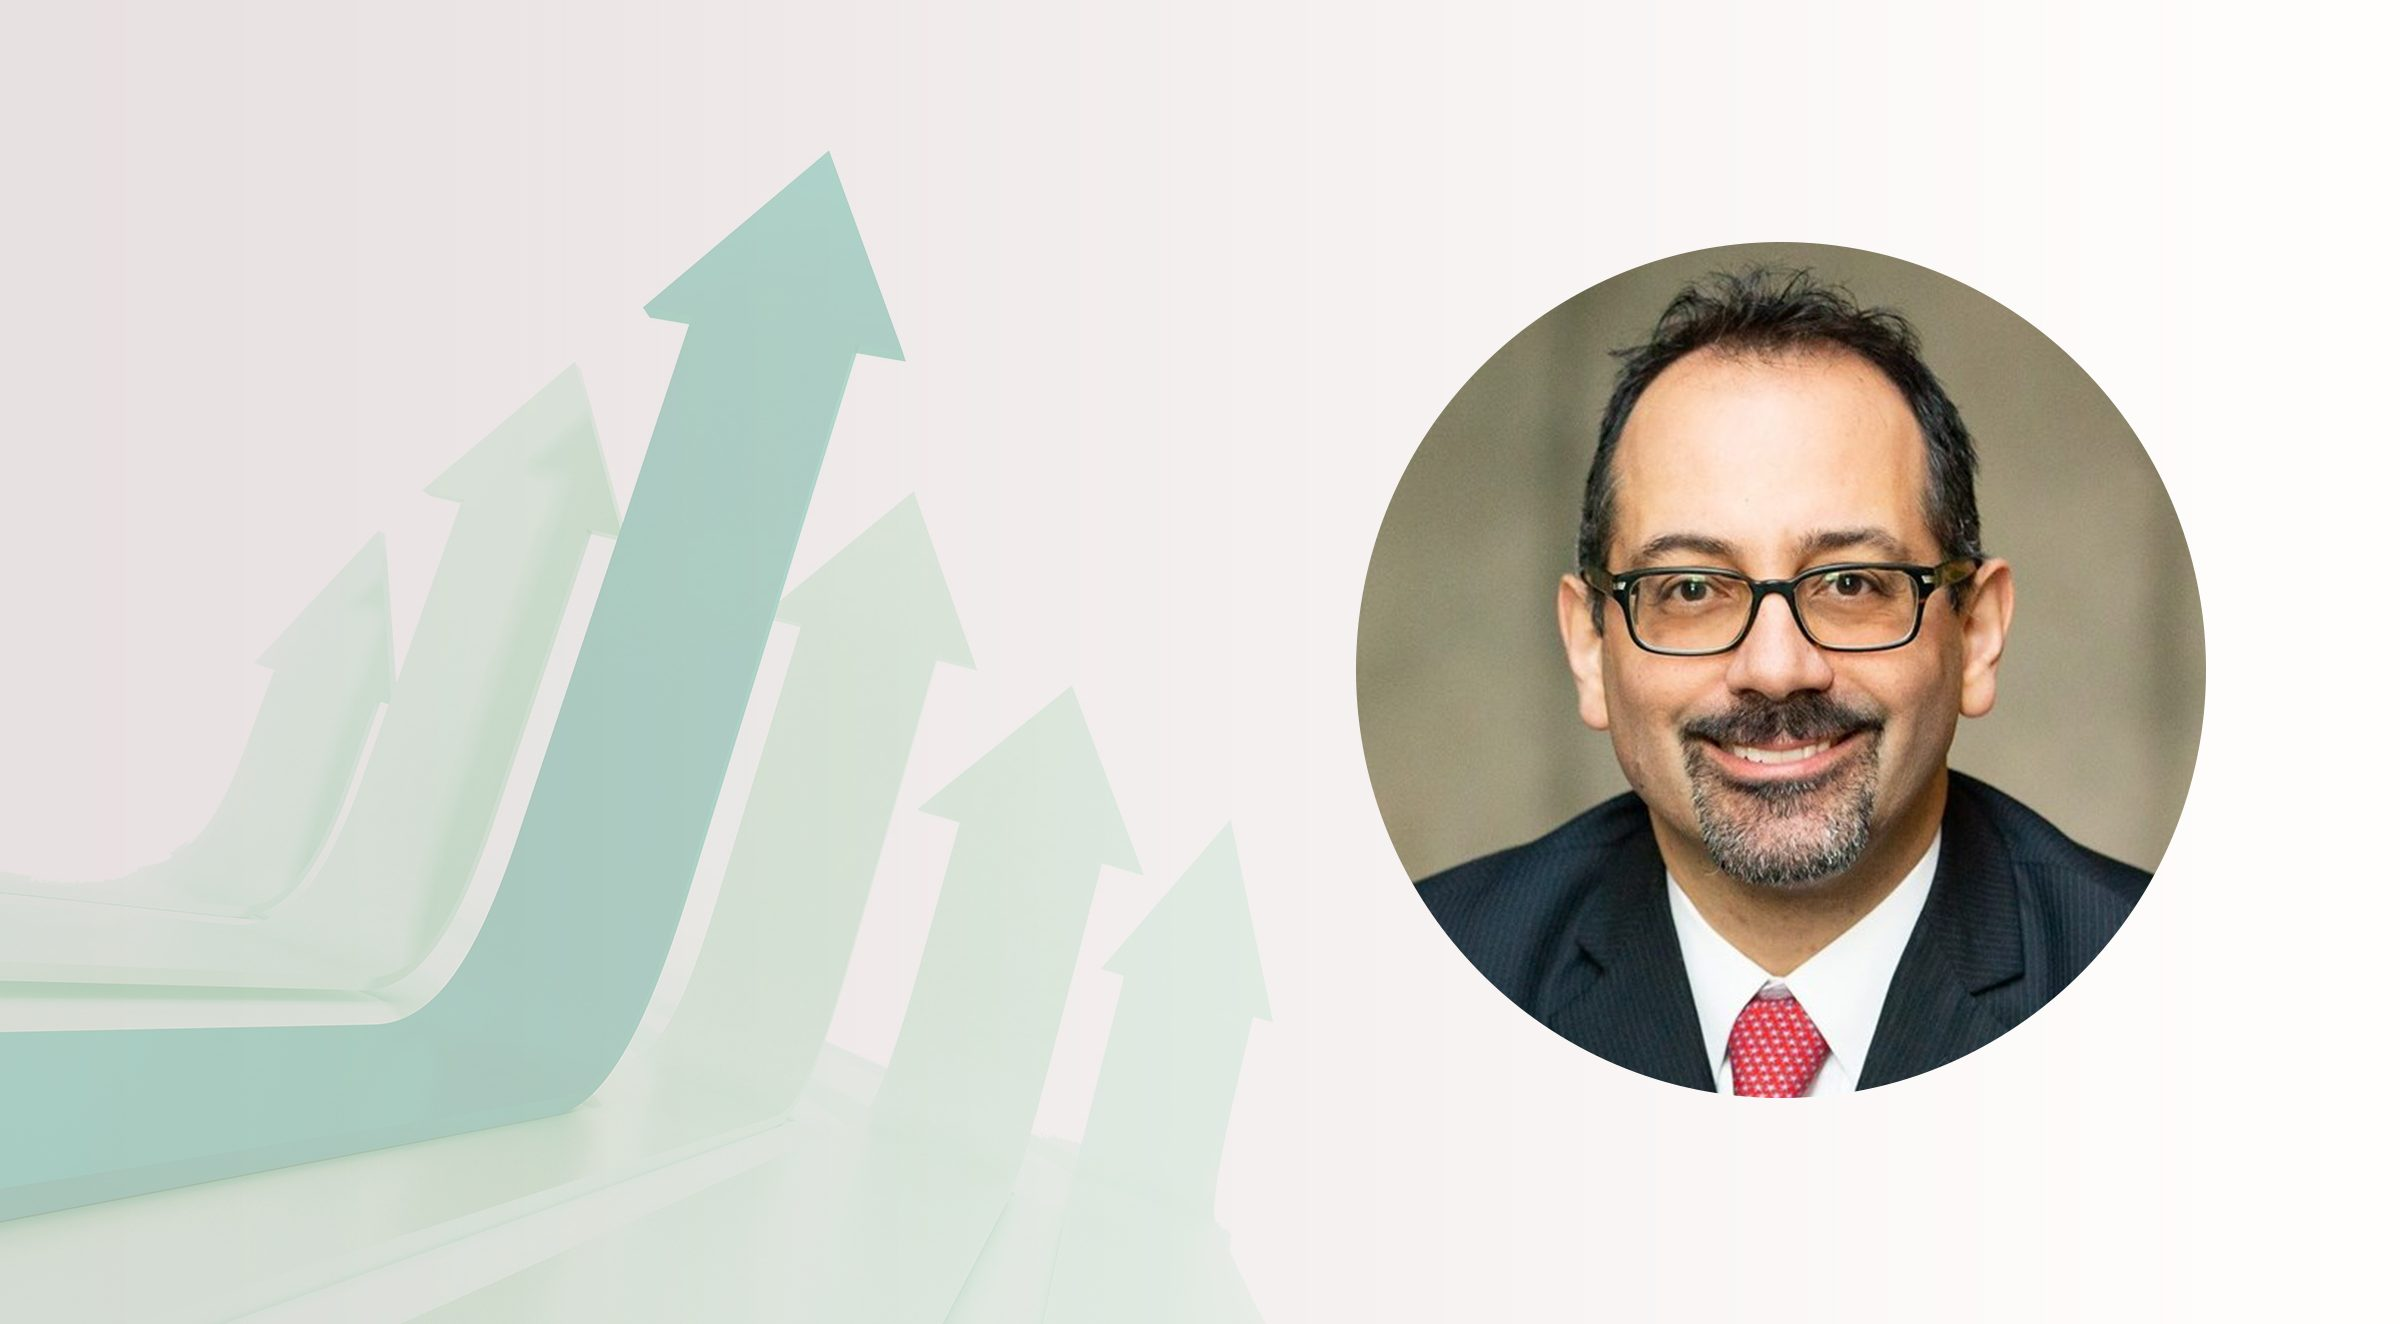 financial advisor interview with Dan Greco